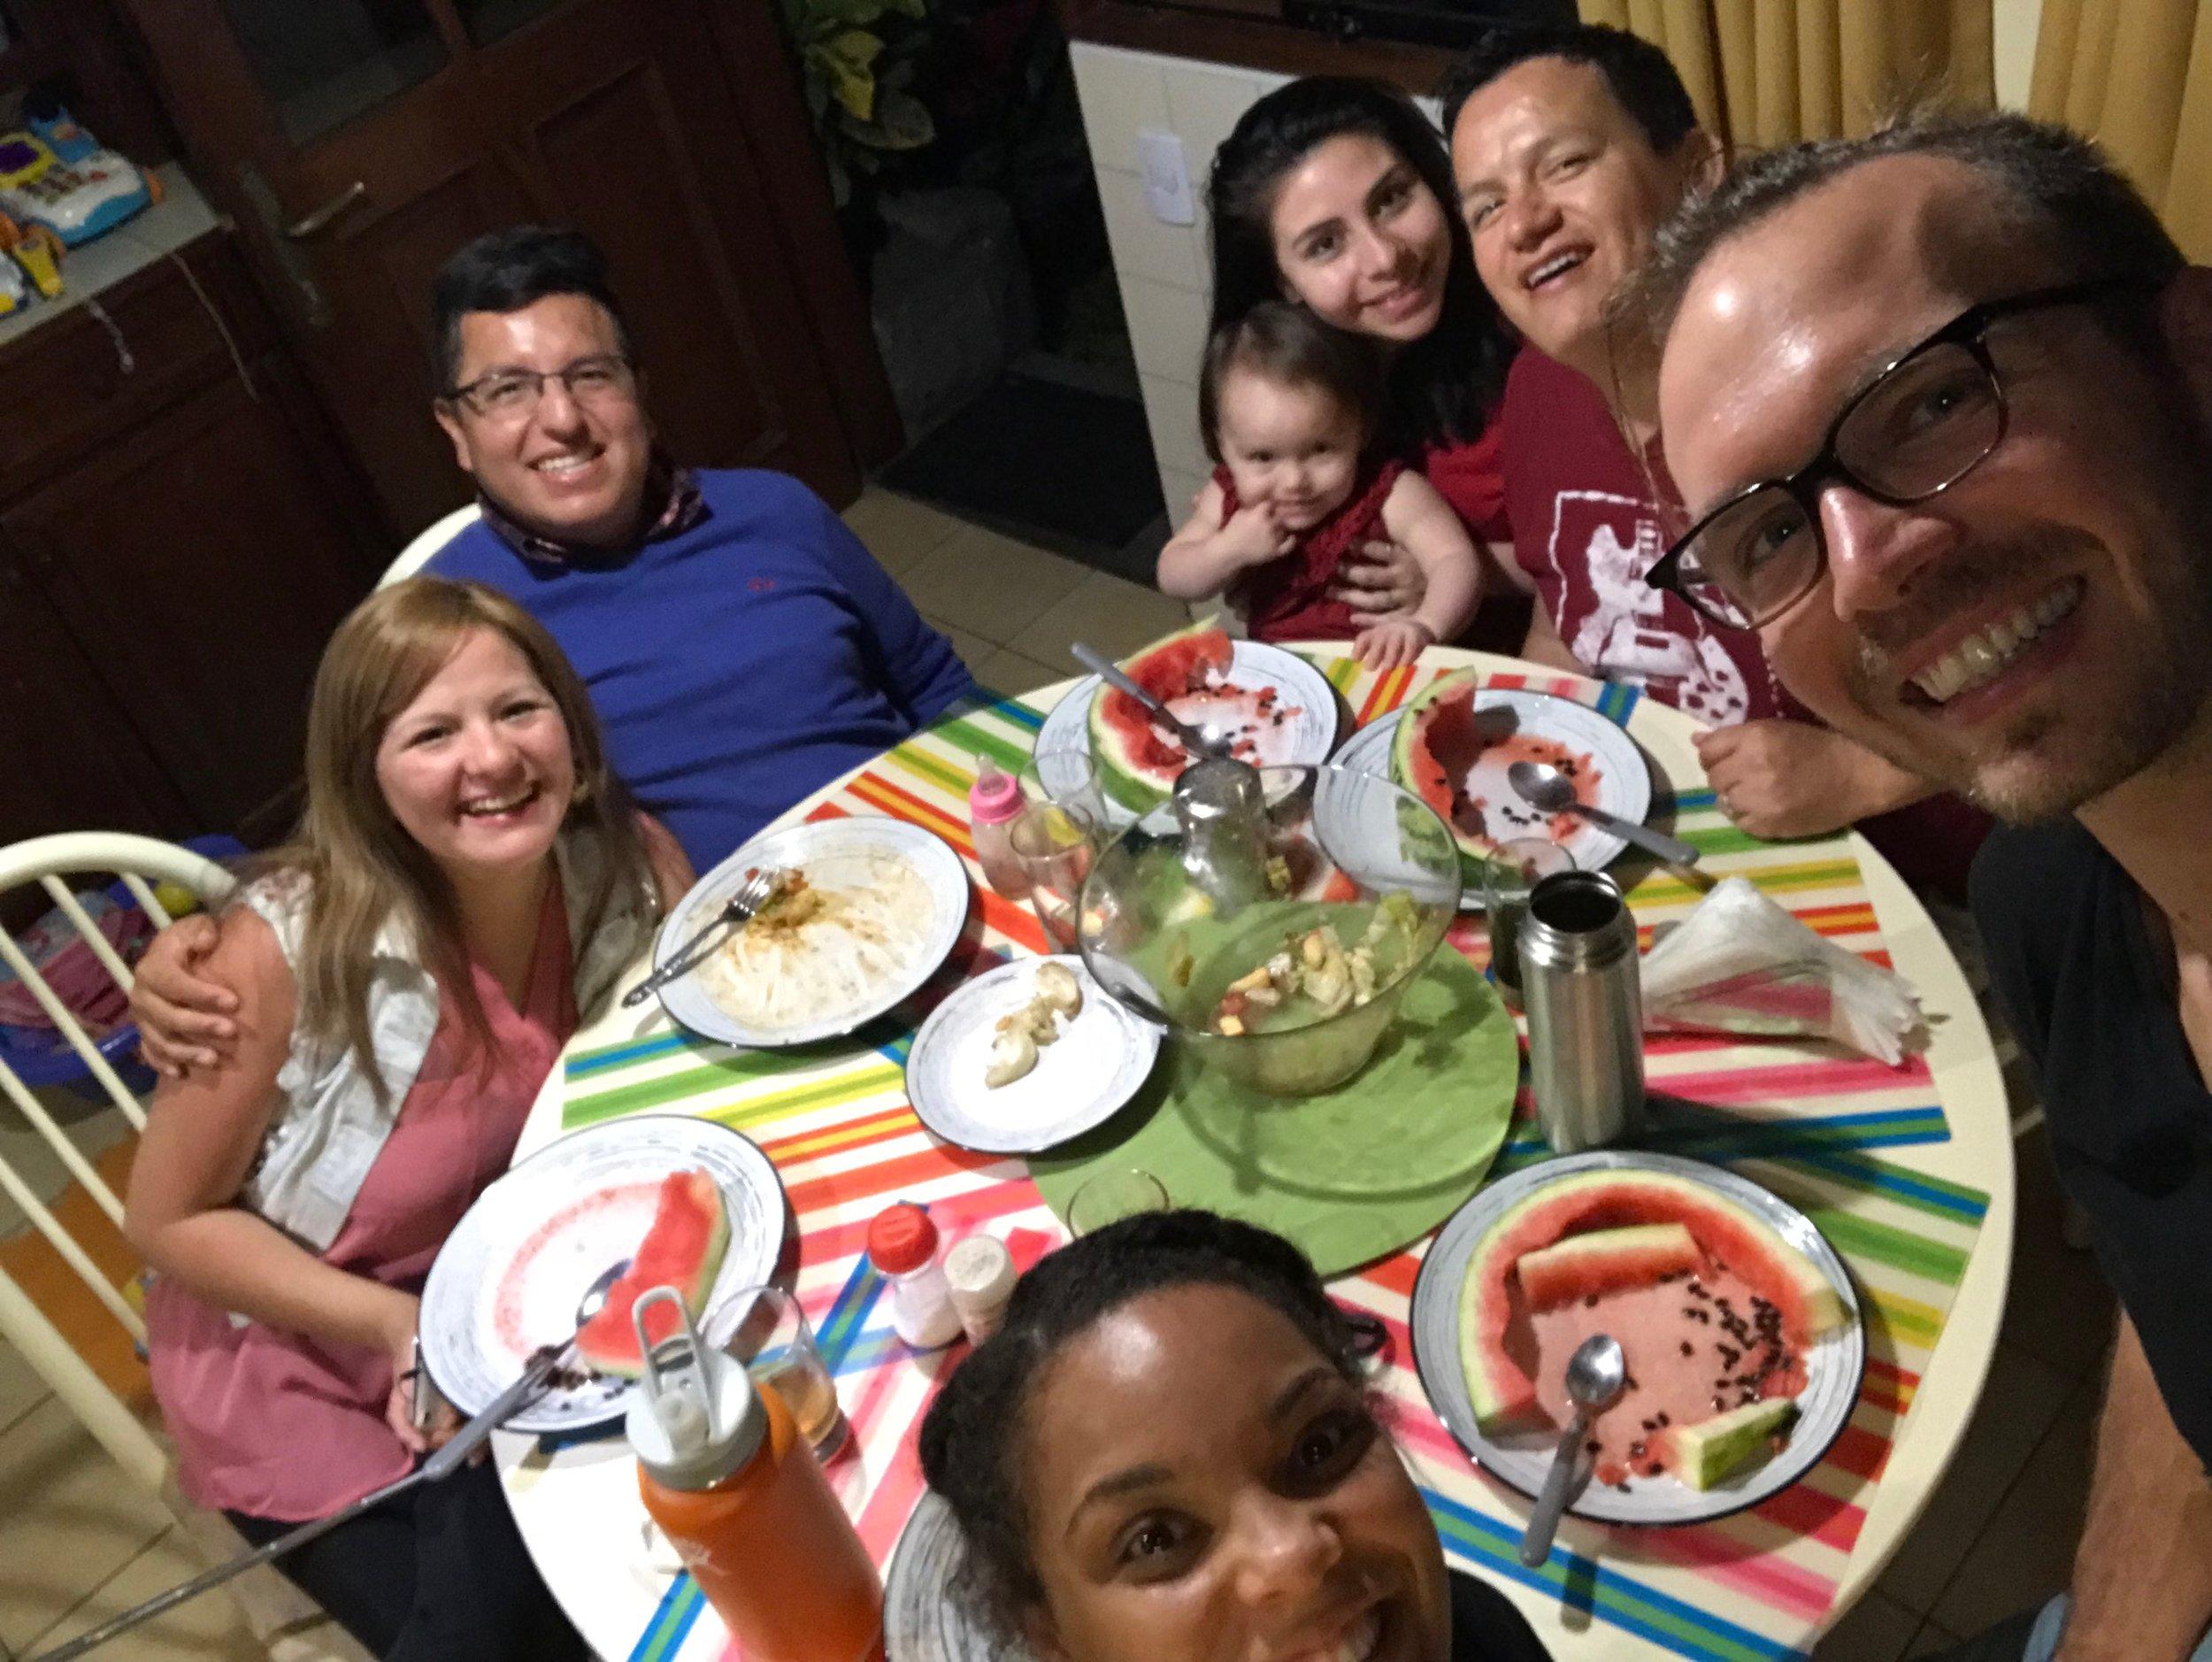 From left: Caroley, her husband Albert, Tamara, Josh, and their baby Charlotte!